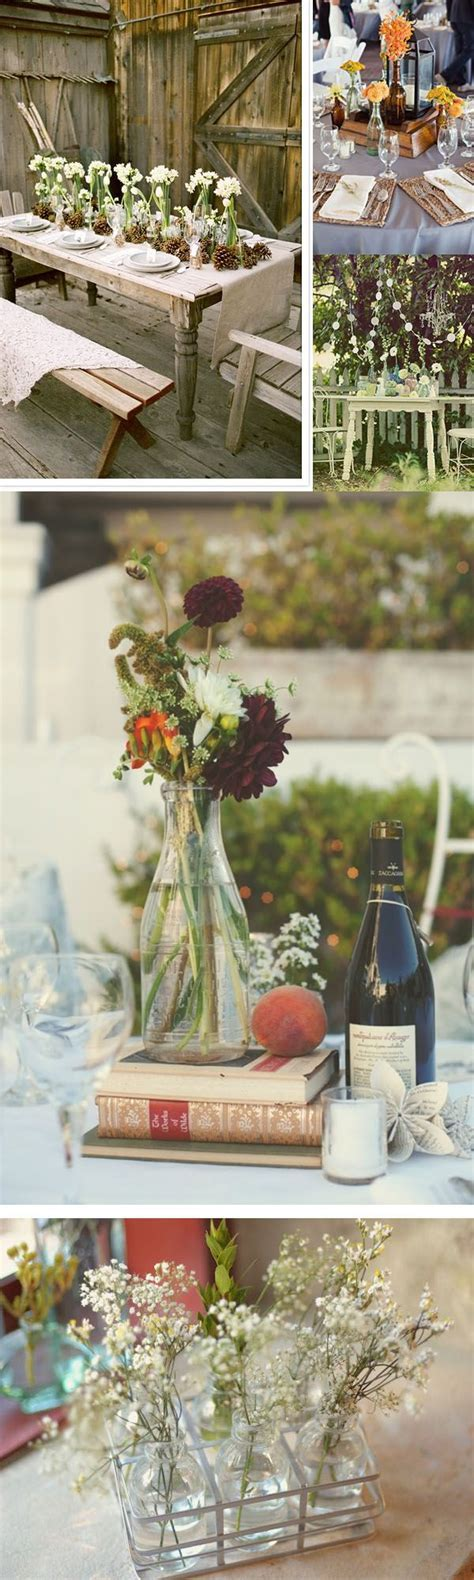 vintage glass bottles wedding table centre piece